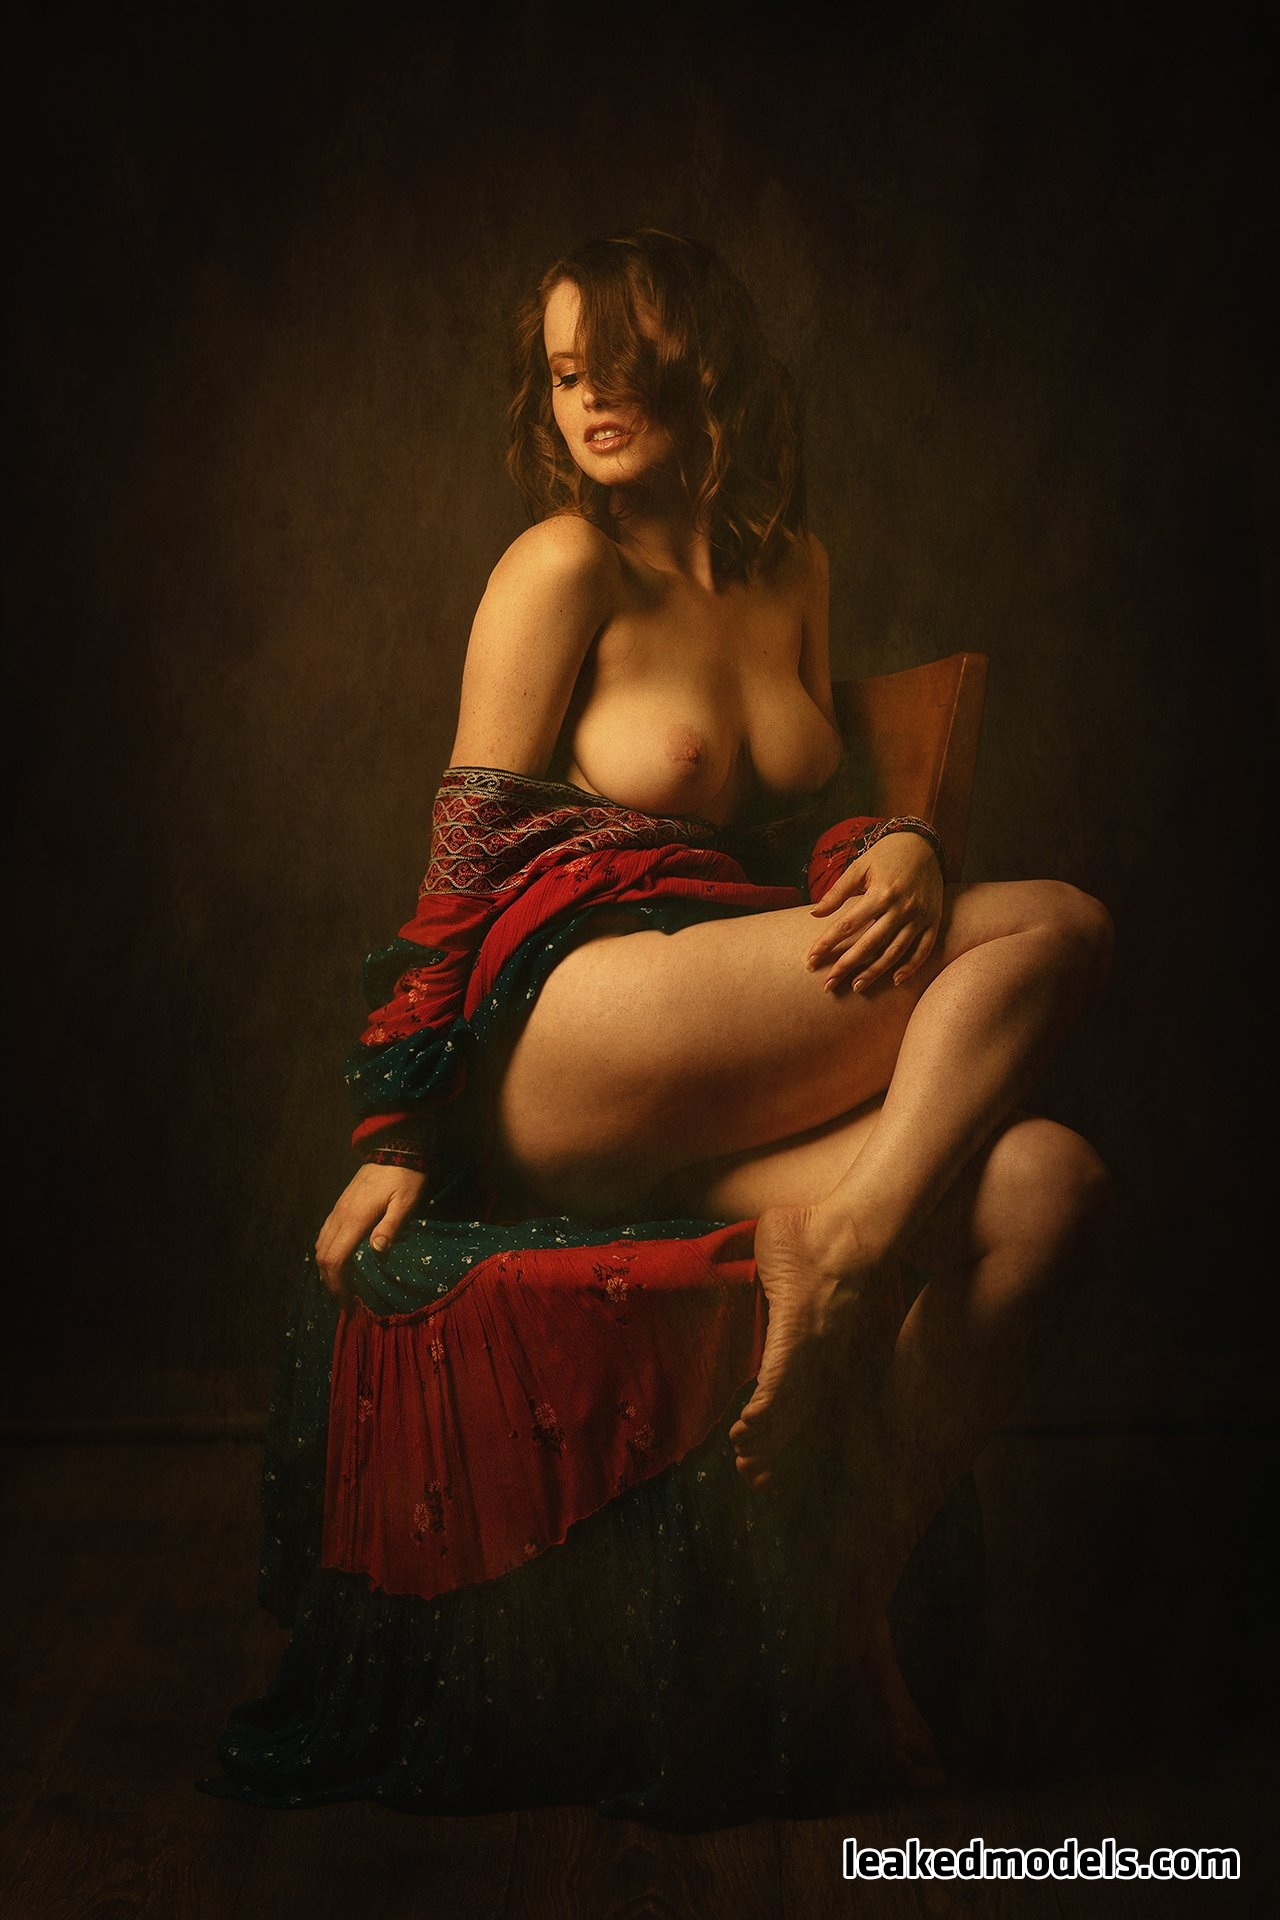 roza tselniker leaked nude leakedmodels.com 0061 - Roza Tselniker Instagram Nude Leaks (27 Photos)